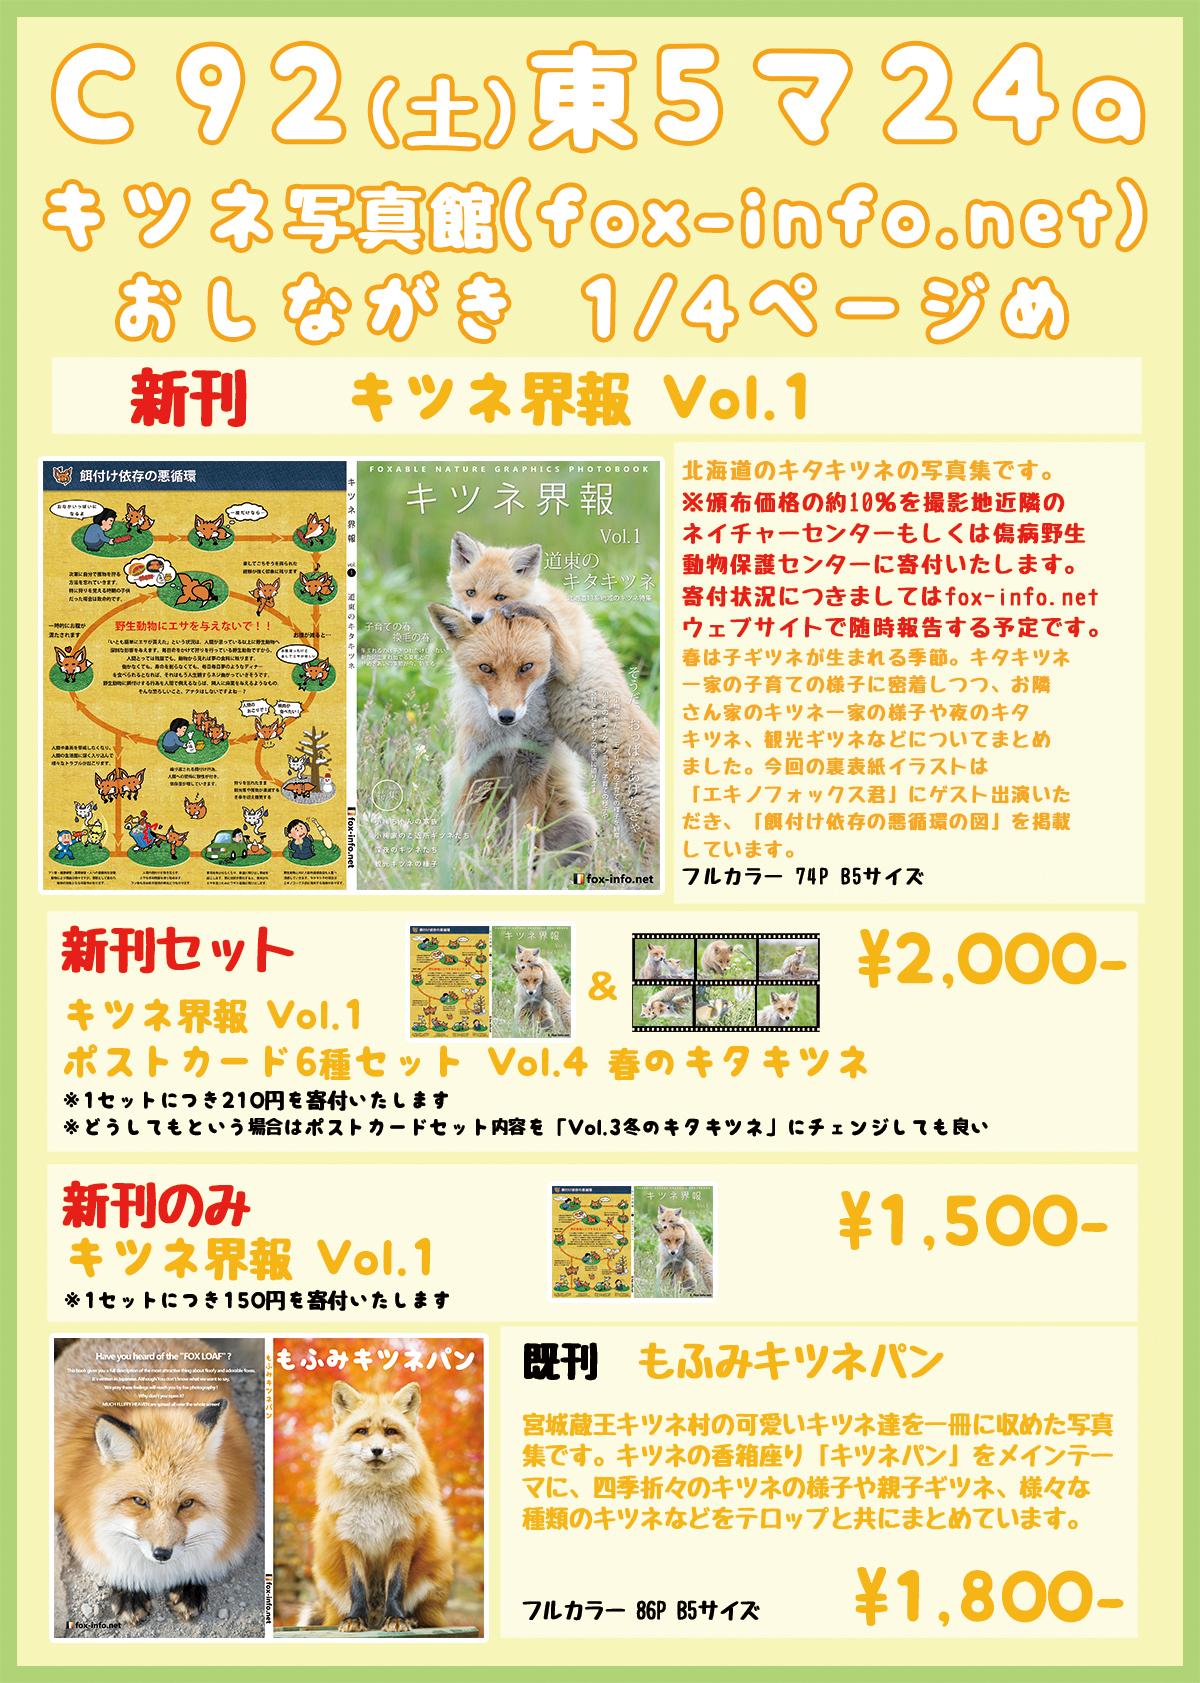 C92_fox-info.net(キツネ写真館)